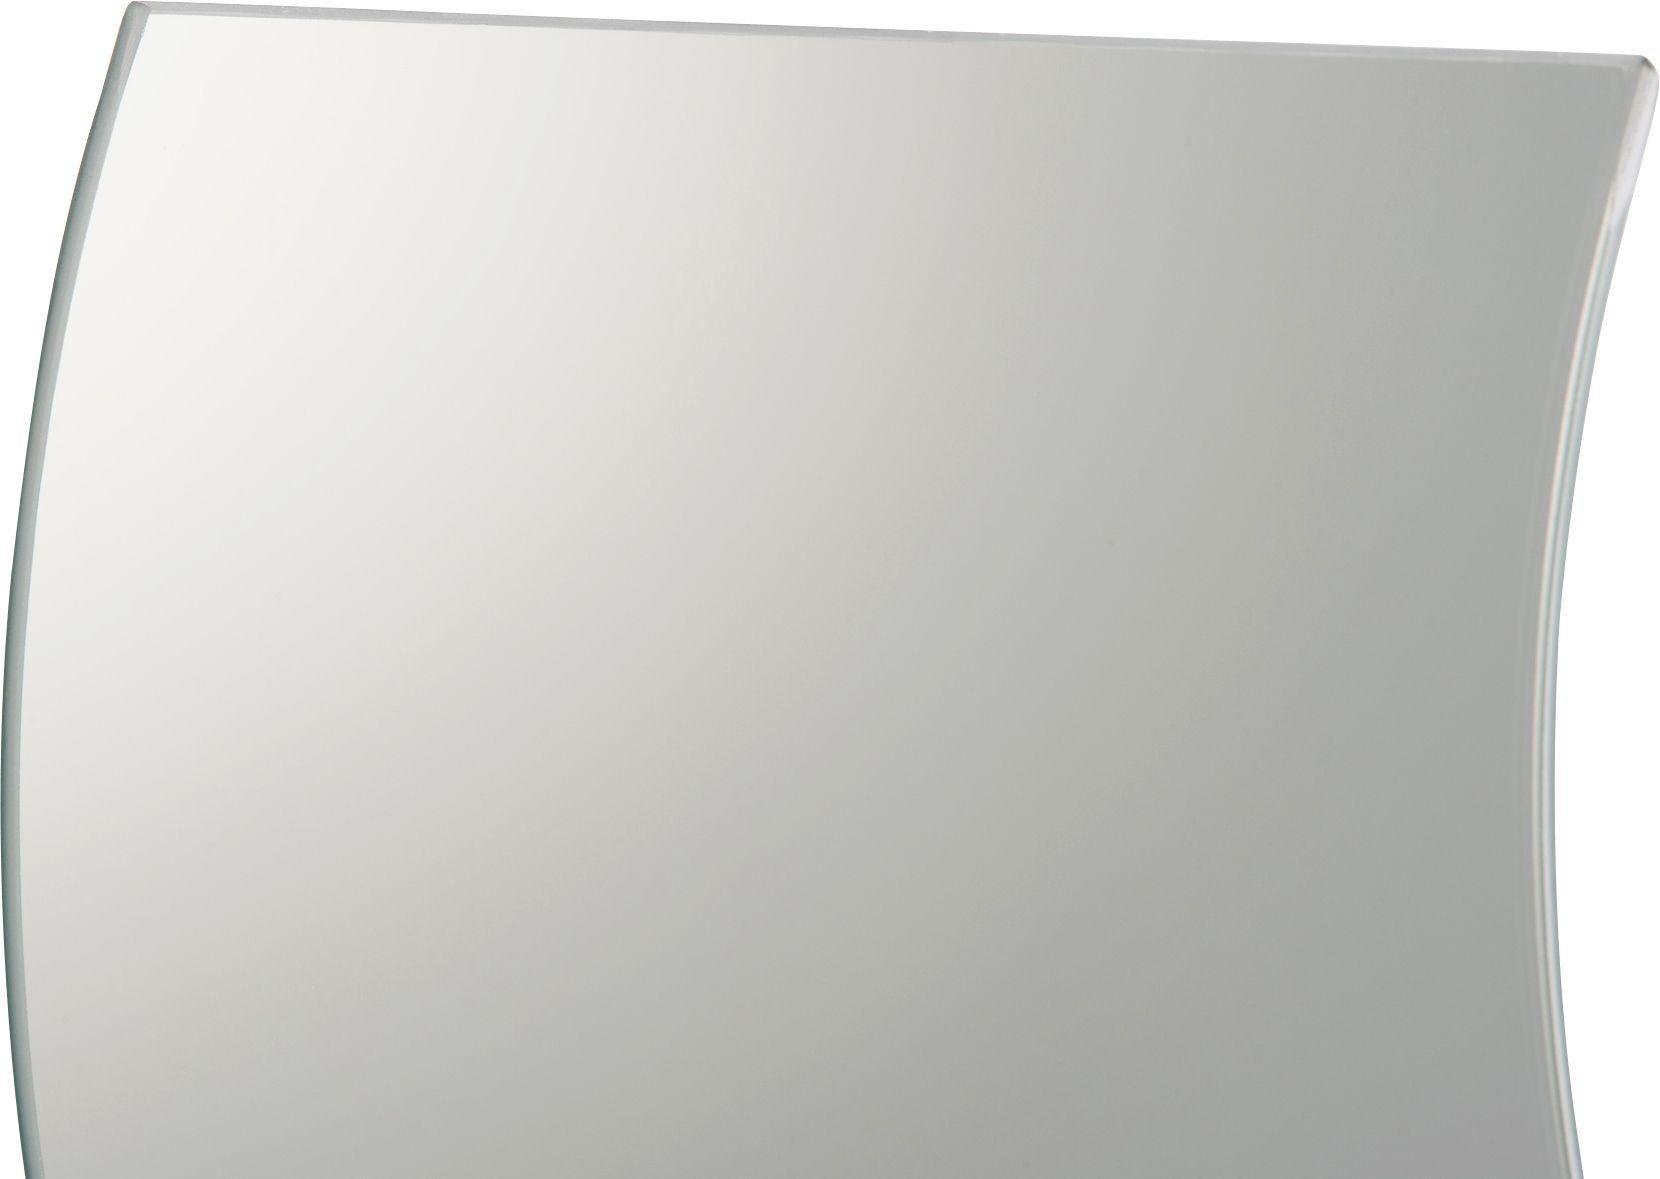 Completely new Buy HOME Full Length Wavy Wall Mirror | Mirrors | Argos WS21